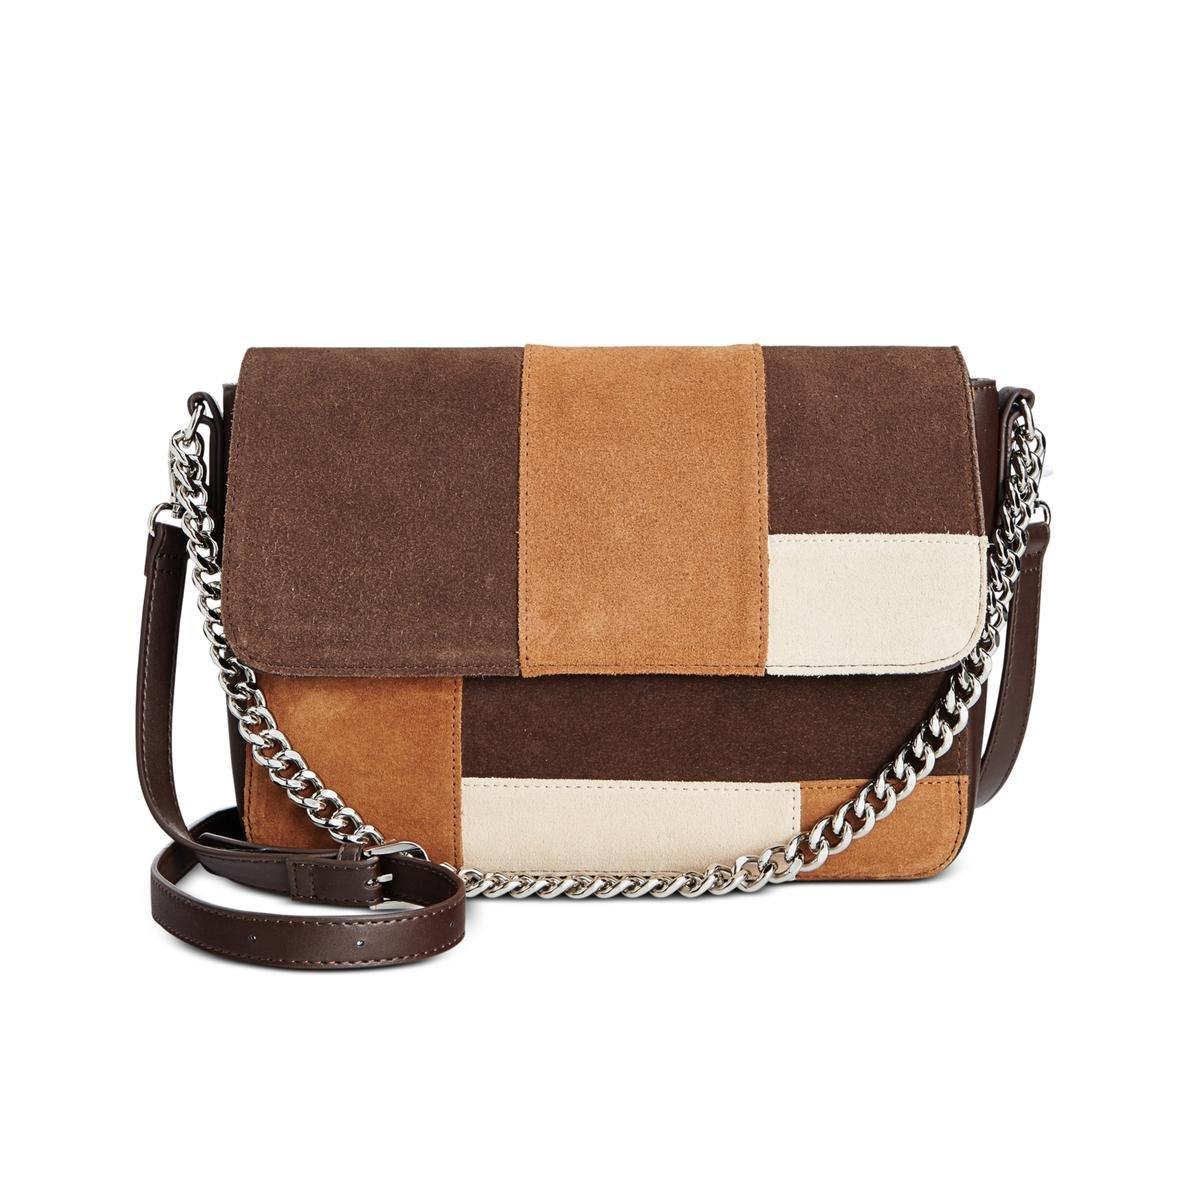 a467953dda Giani Bernini Womens Leather Suede Crossbody Handbag Brown Large ...